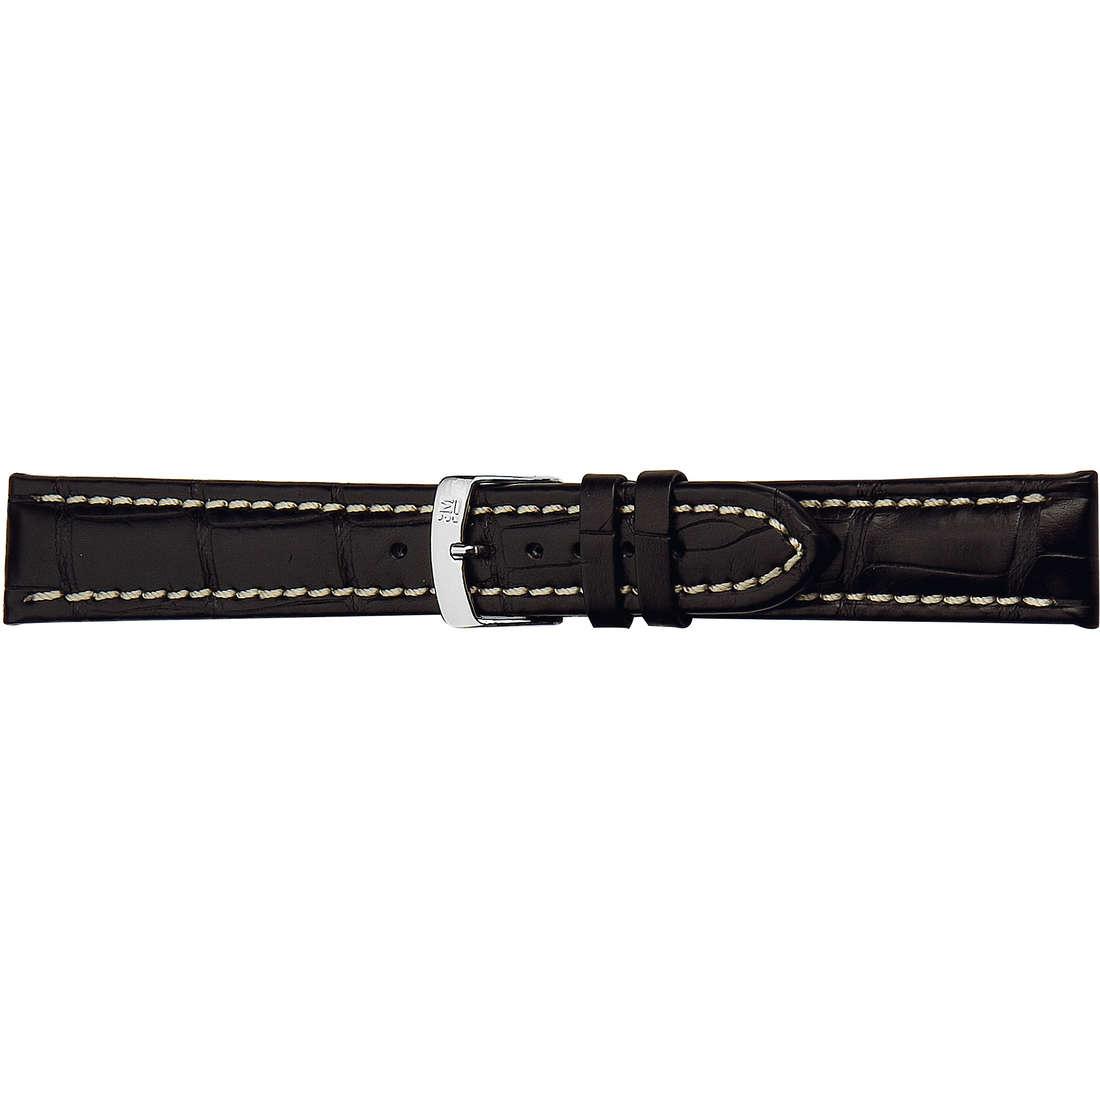 watch watch bands watch straps man Morellato Pelli Preziose A01U2573339019CR22